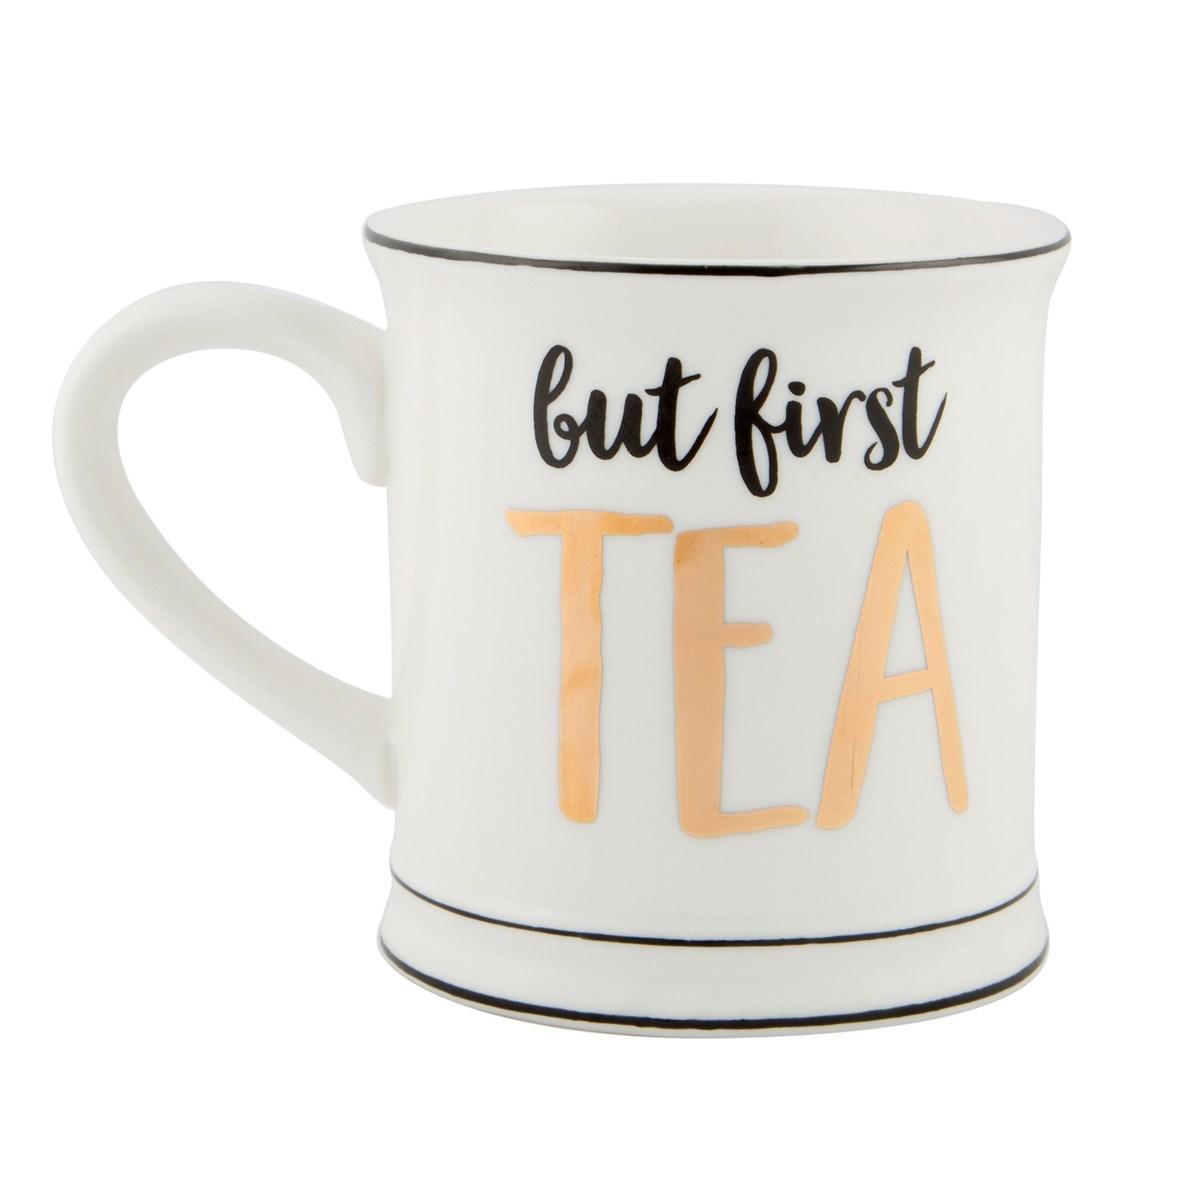 Metallic Monochrome Mug (But First Tea) image